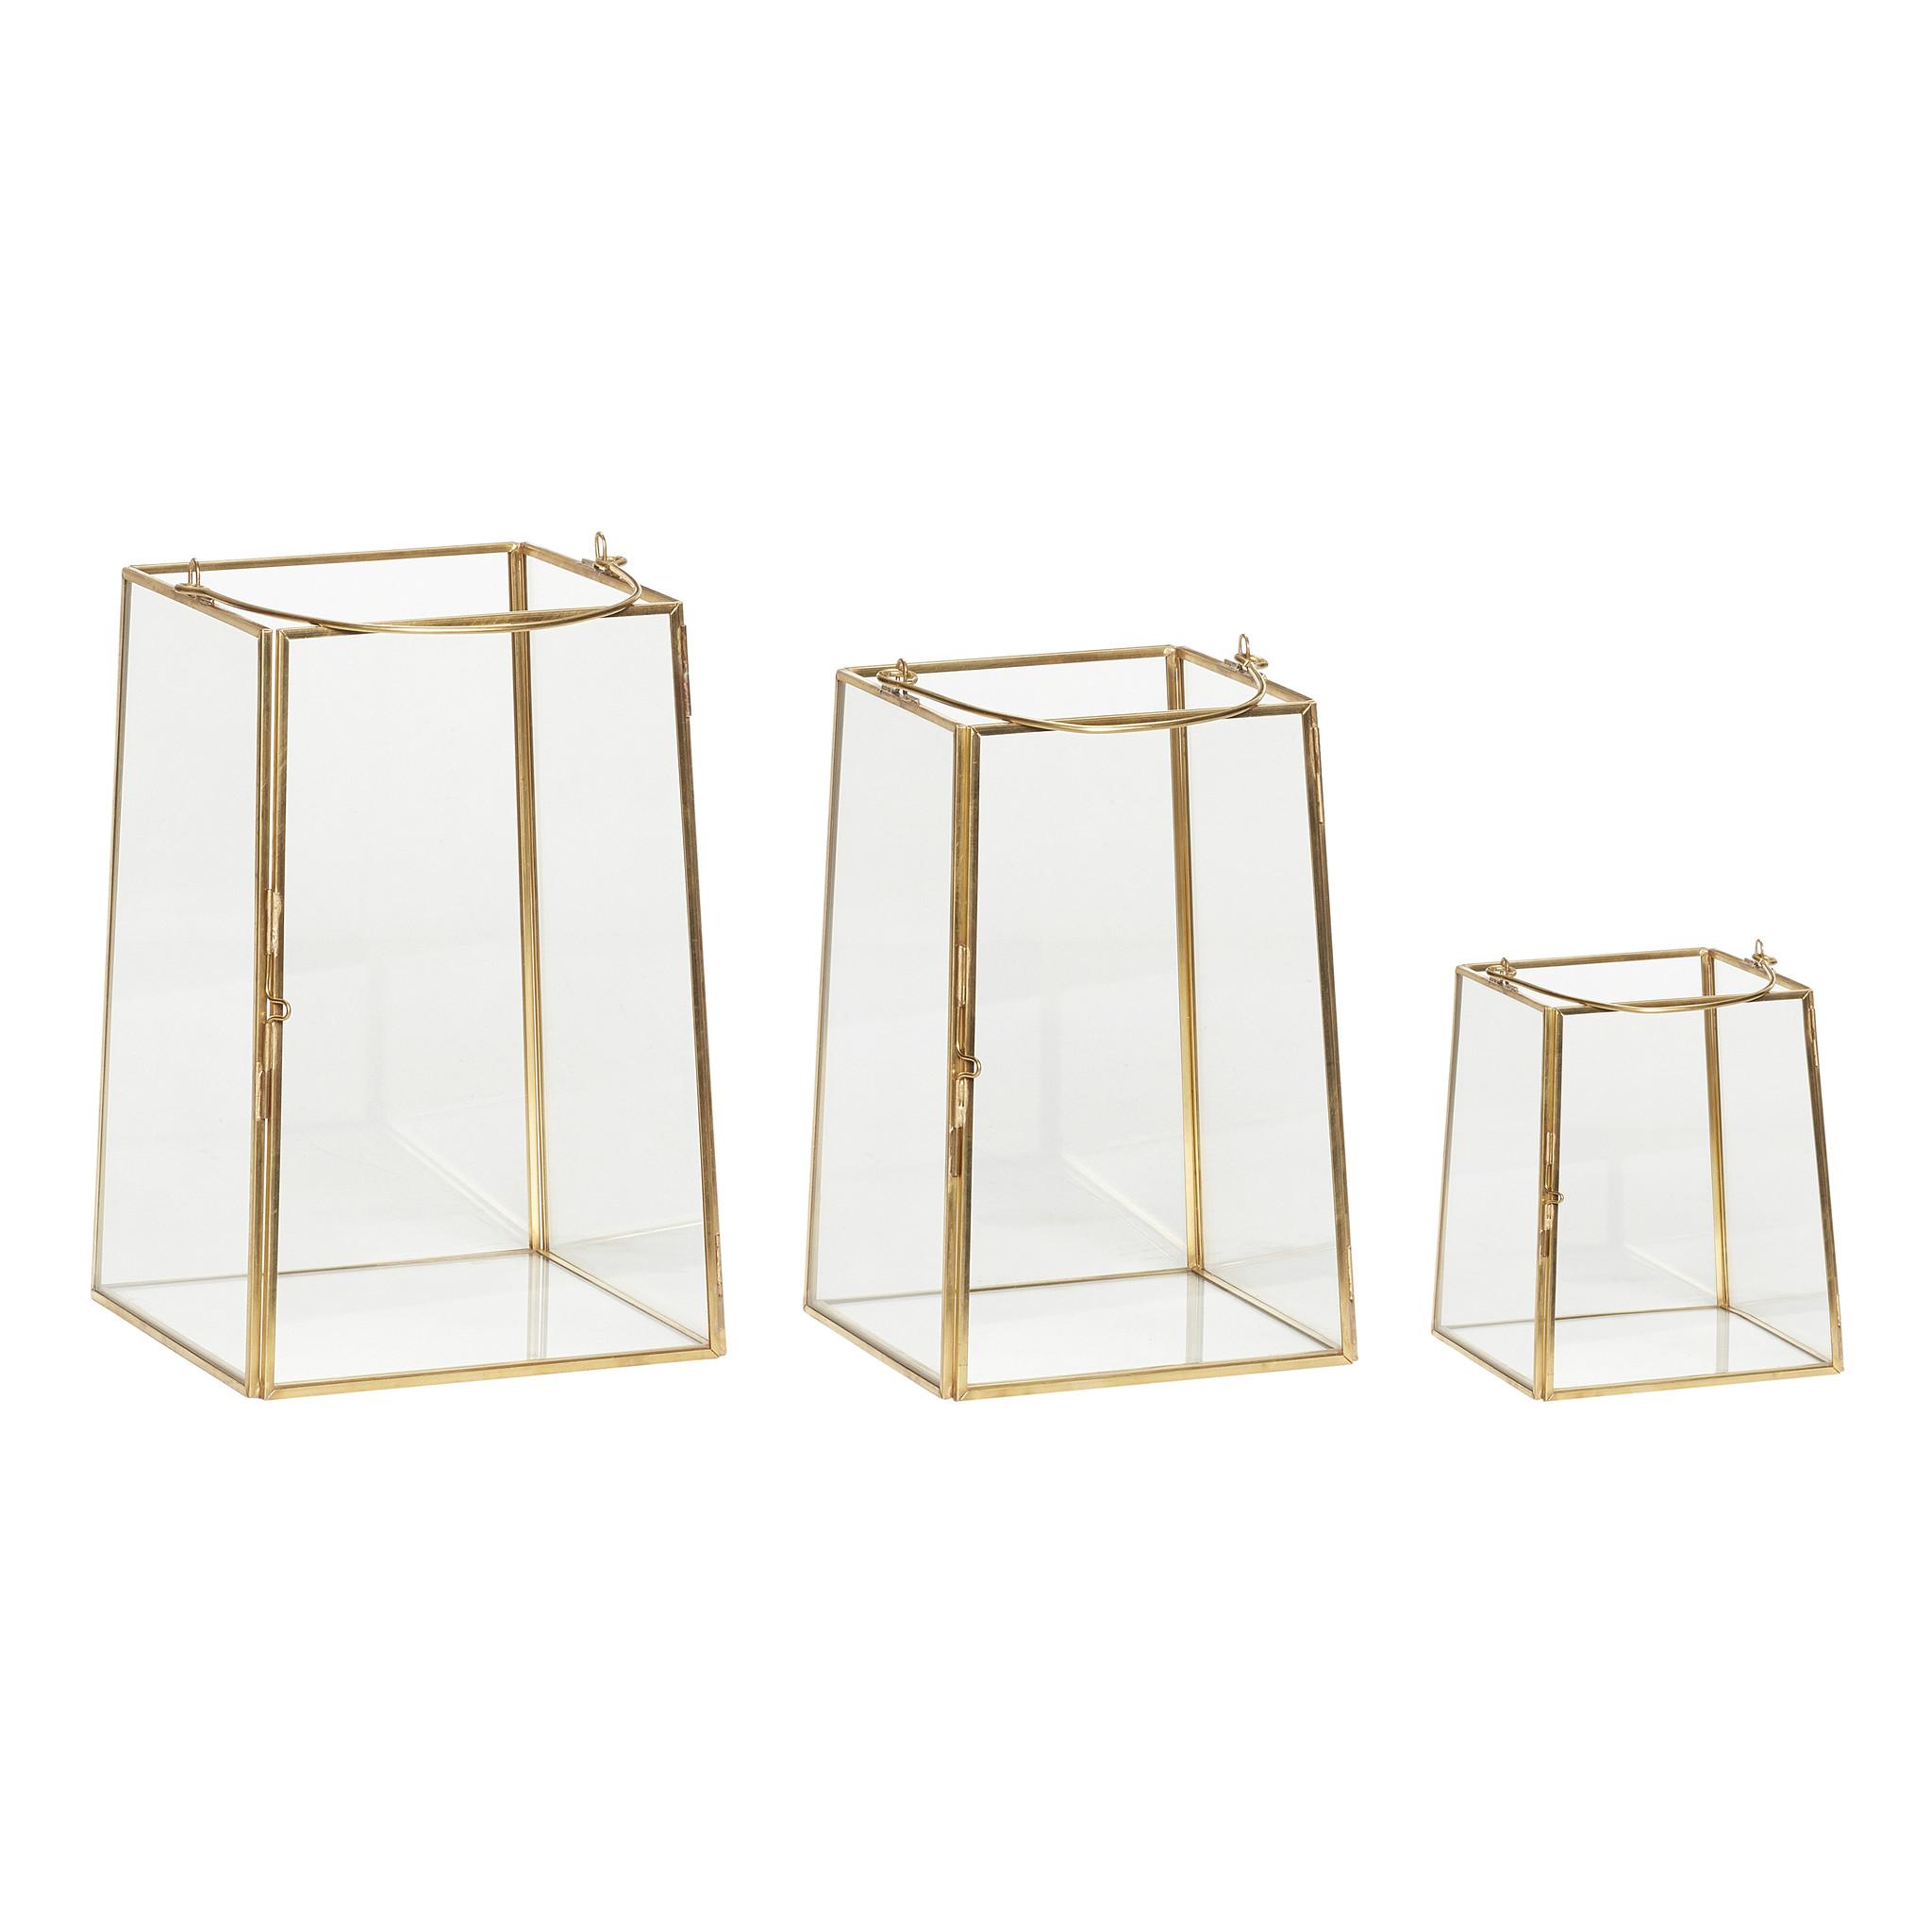 Hubsch Lantaarn, messing / glas, set van 3-150606-5712772051214